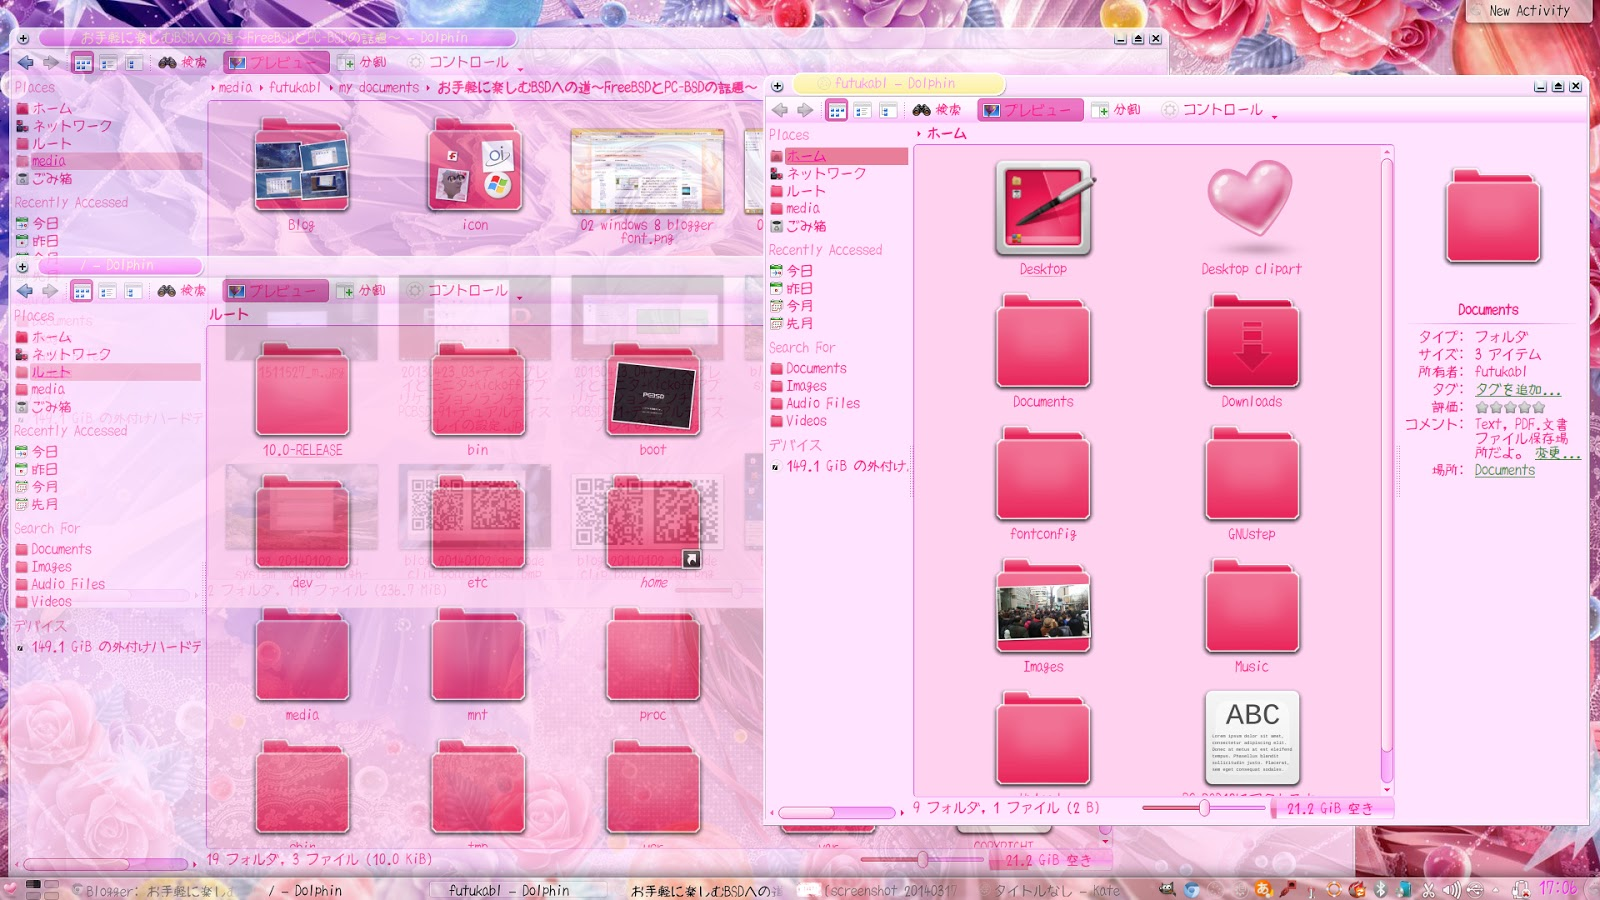 freebsd系os】pc-bsd10.0のデスクトップをカスタマイズ。簡単に萌え化